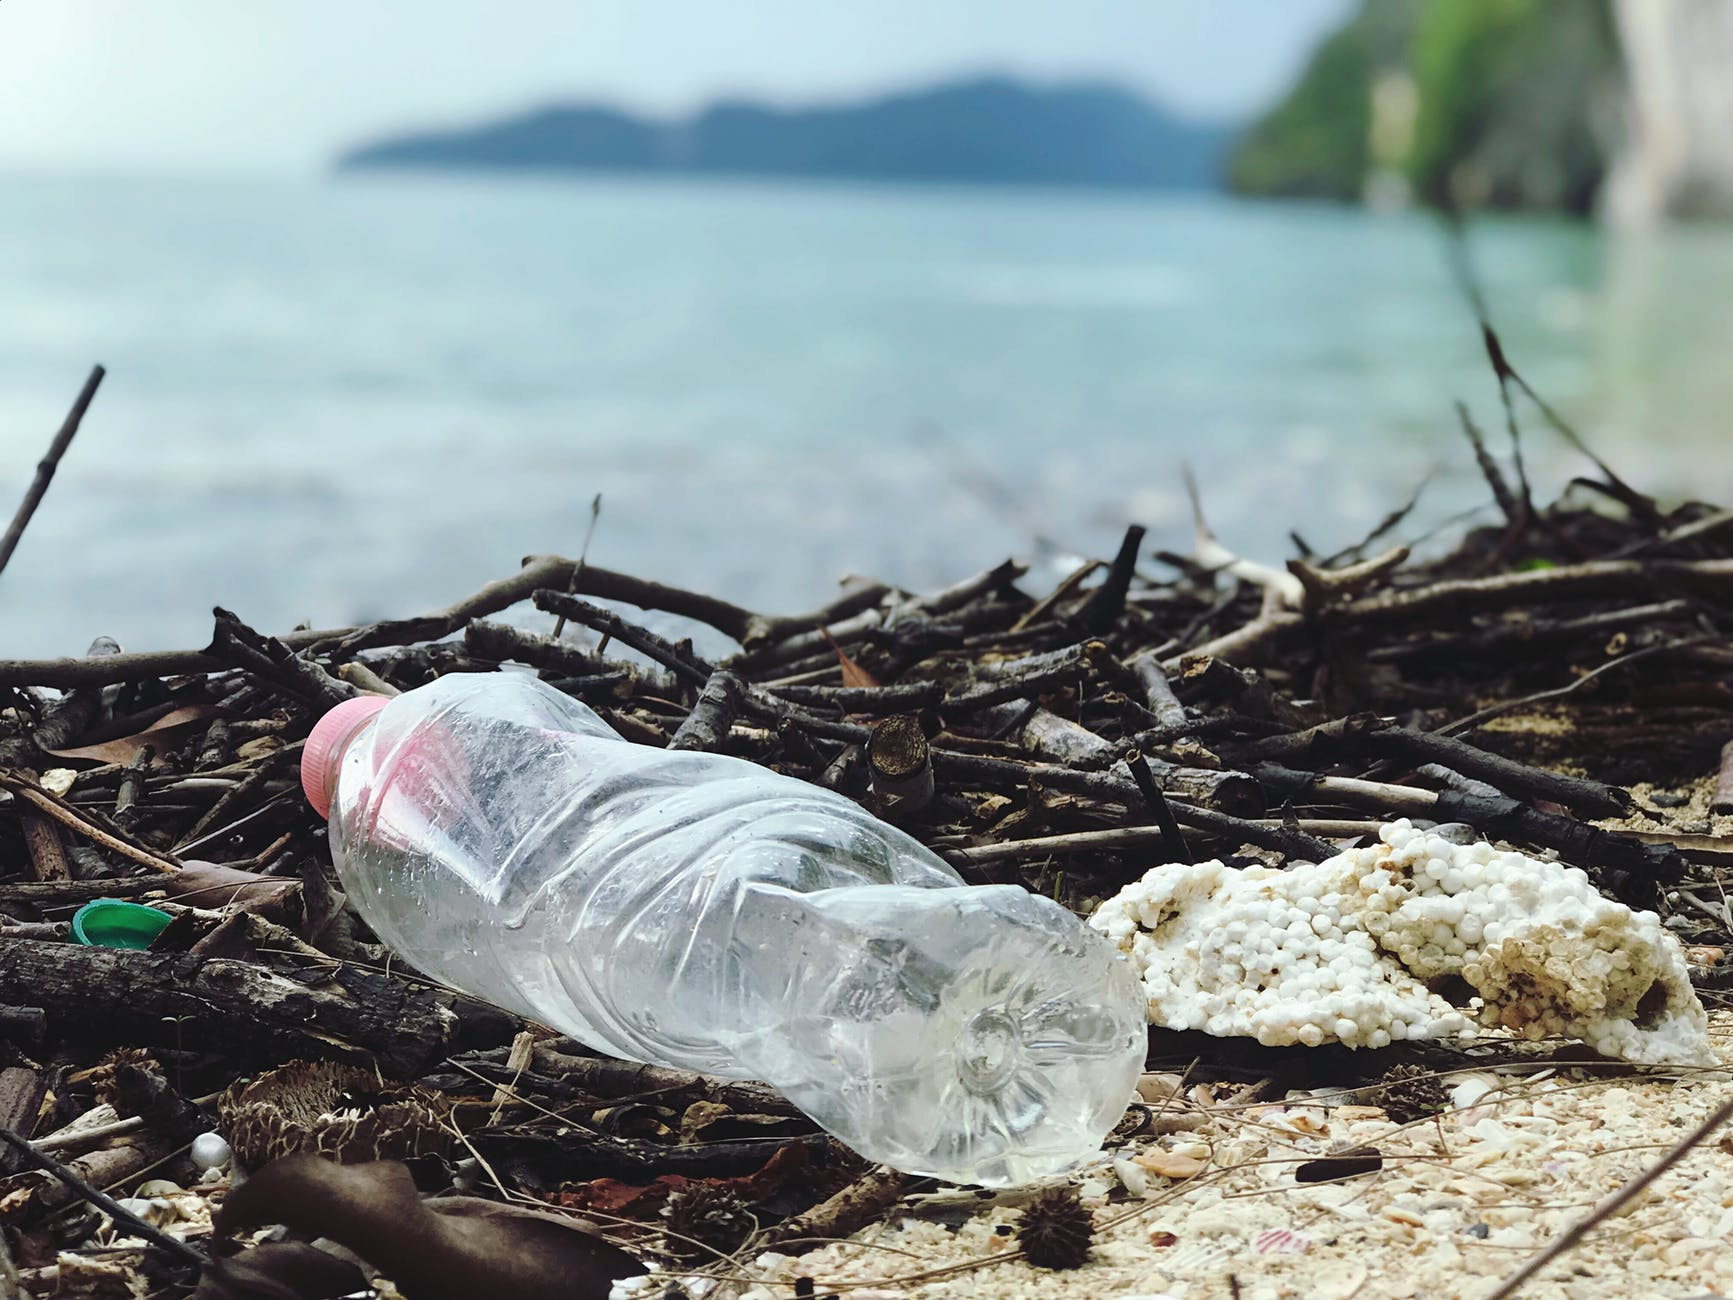 tap water toxins